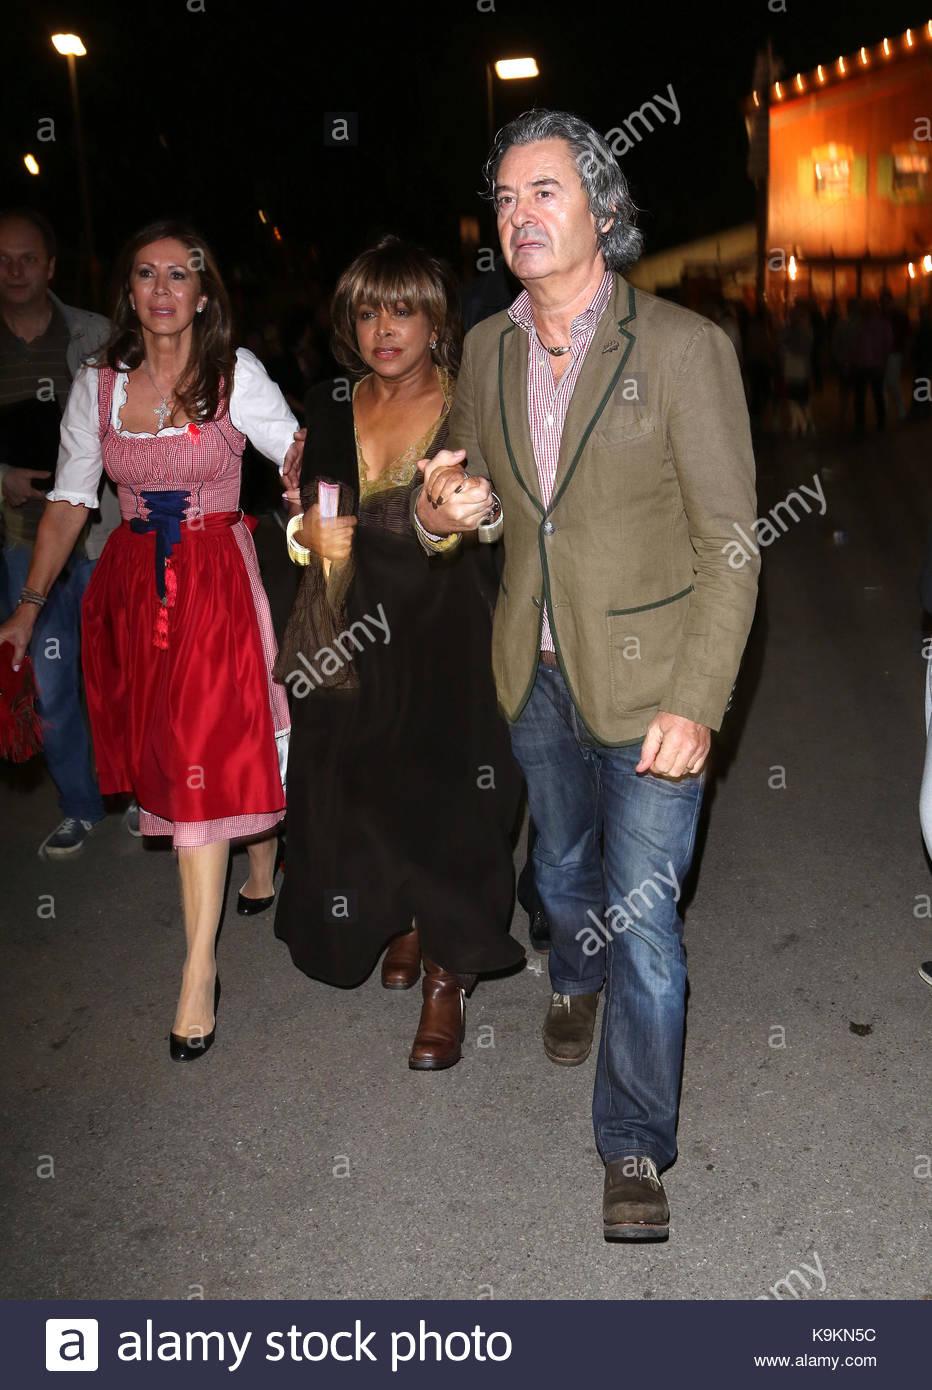 Tina Turner and Erwin Bach. Tina Turner and her husband Erwin Bach Stock Photo: 160858920 - Alamy